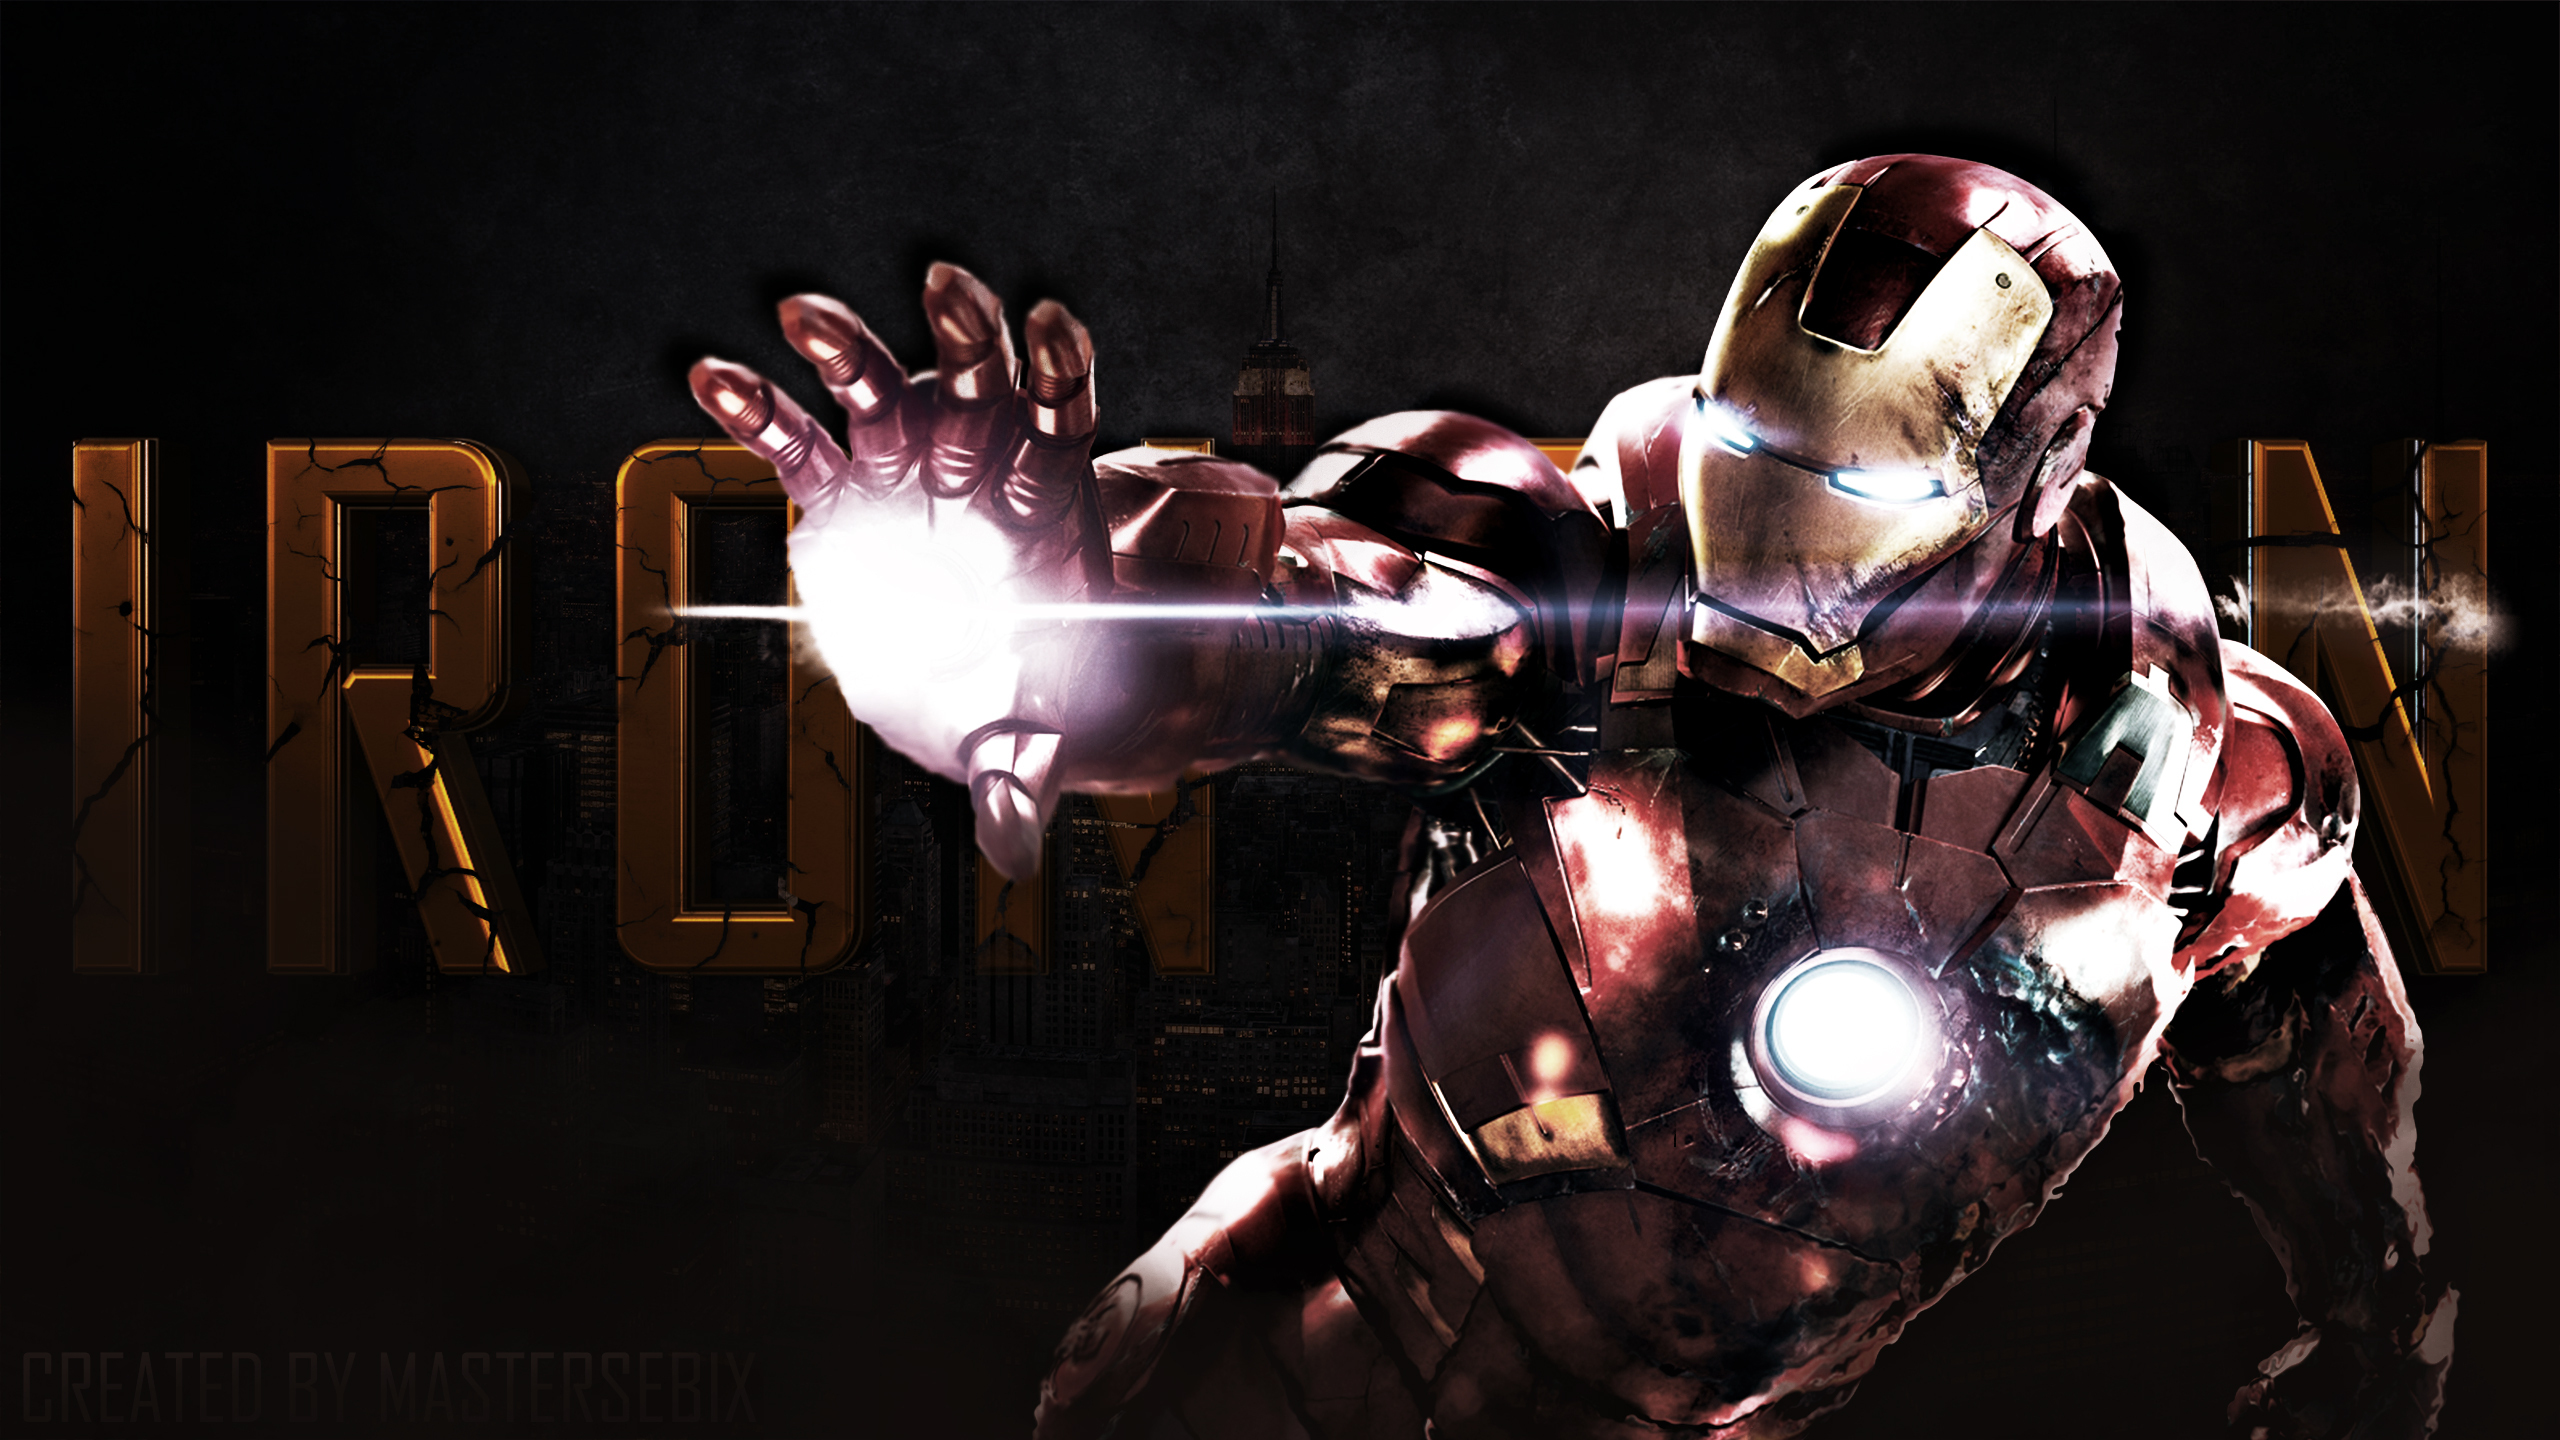 25 Cool Iron Man Wallpapers HD   MixHD wallpapers 2560x1440